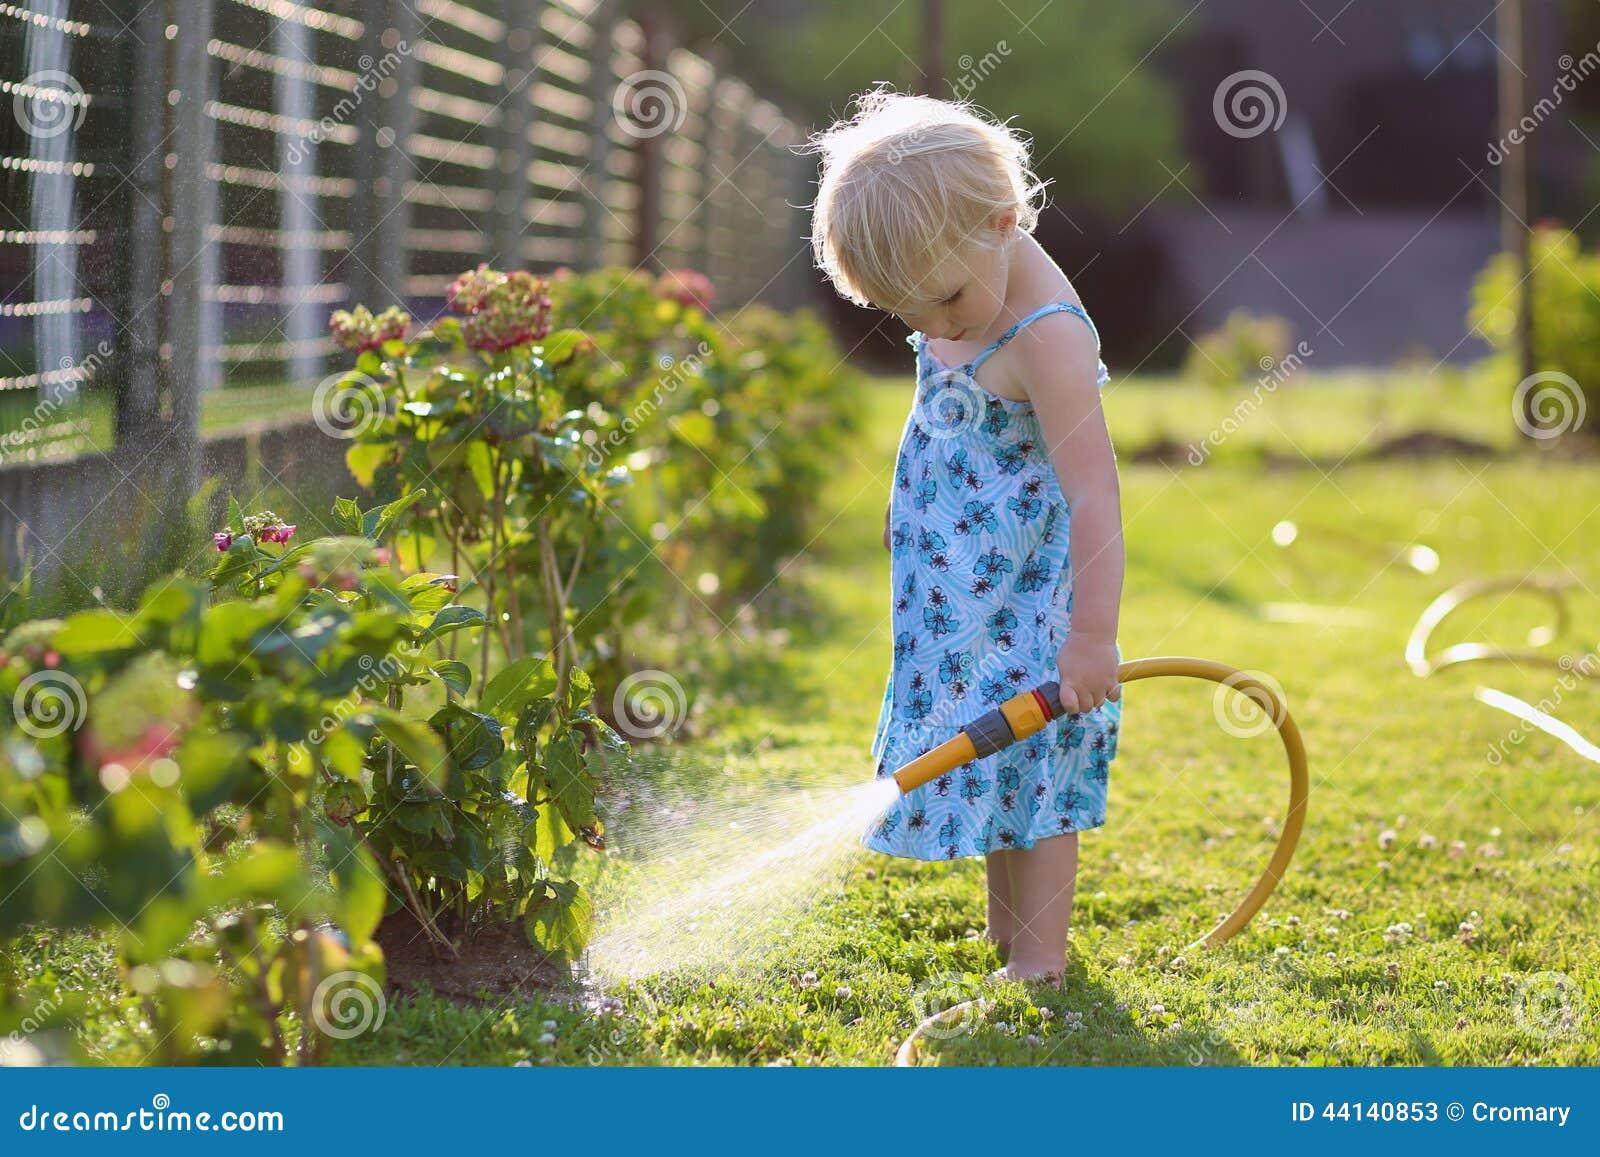 Backyard Garden Irrigation : Little girl watering plants in the garden stock photo